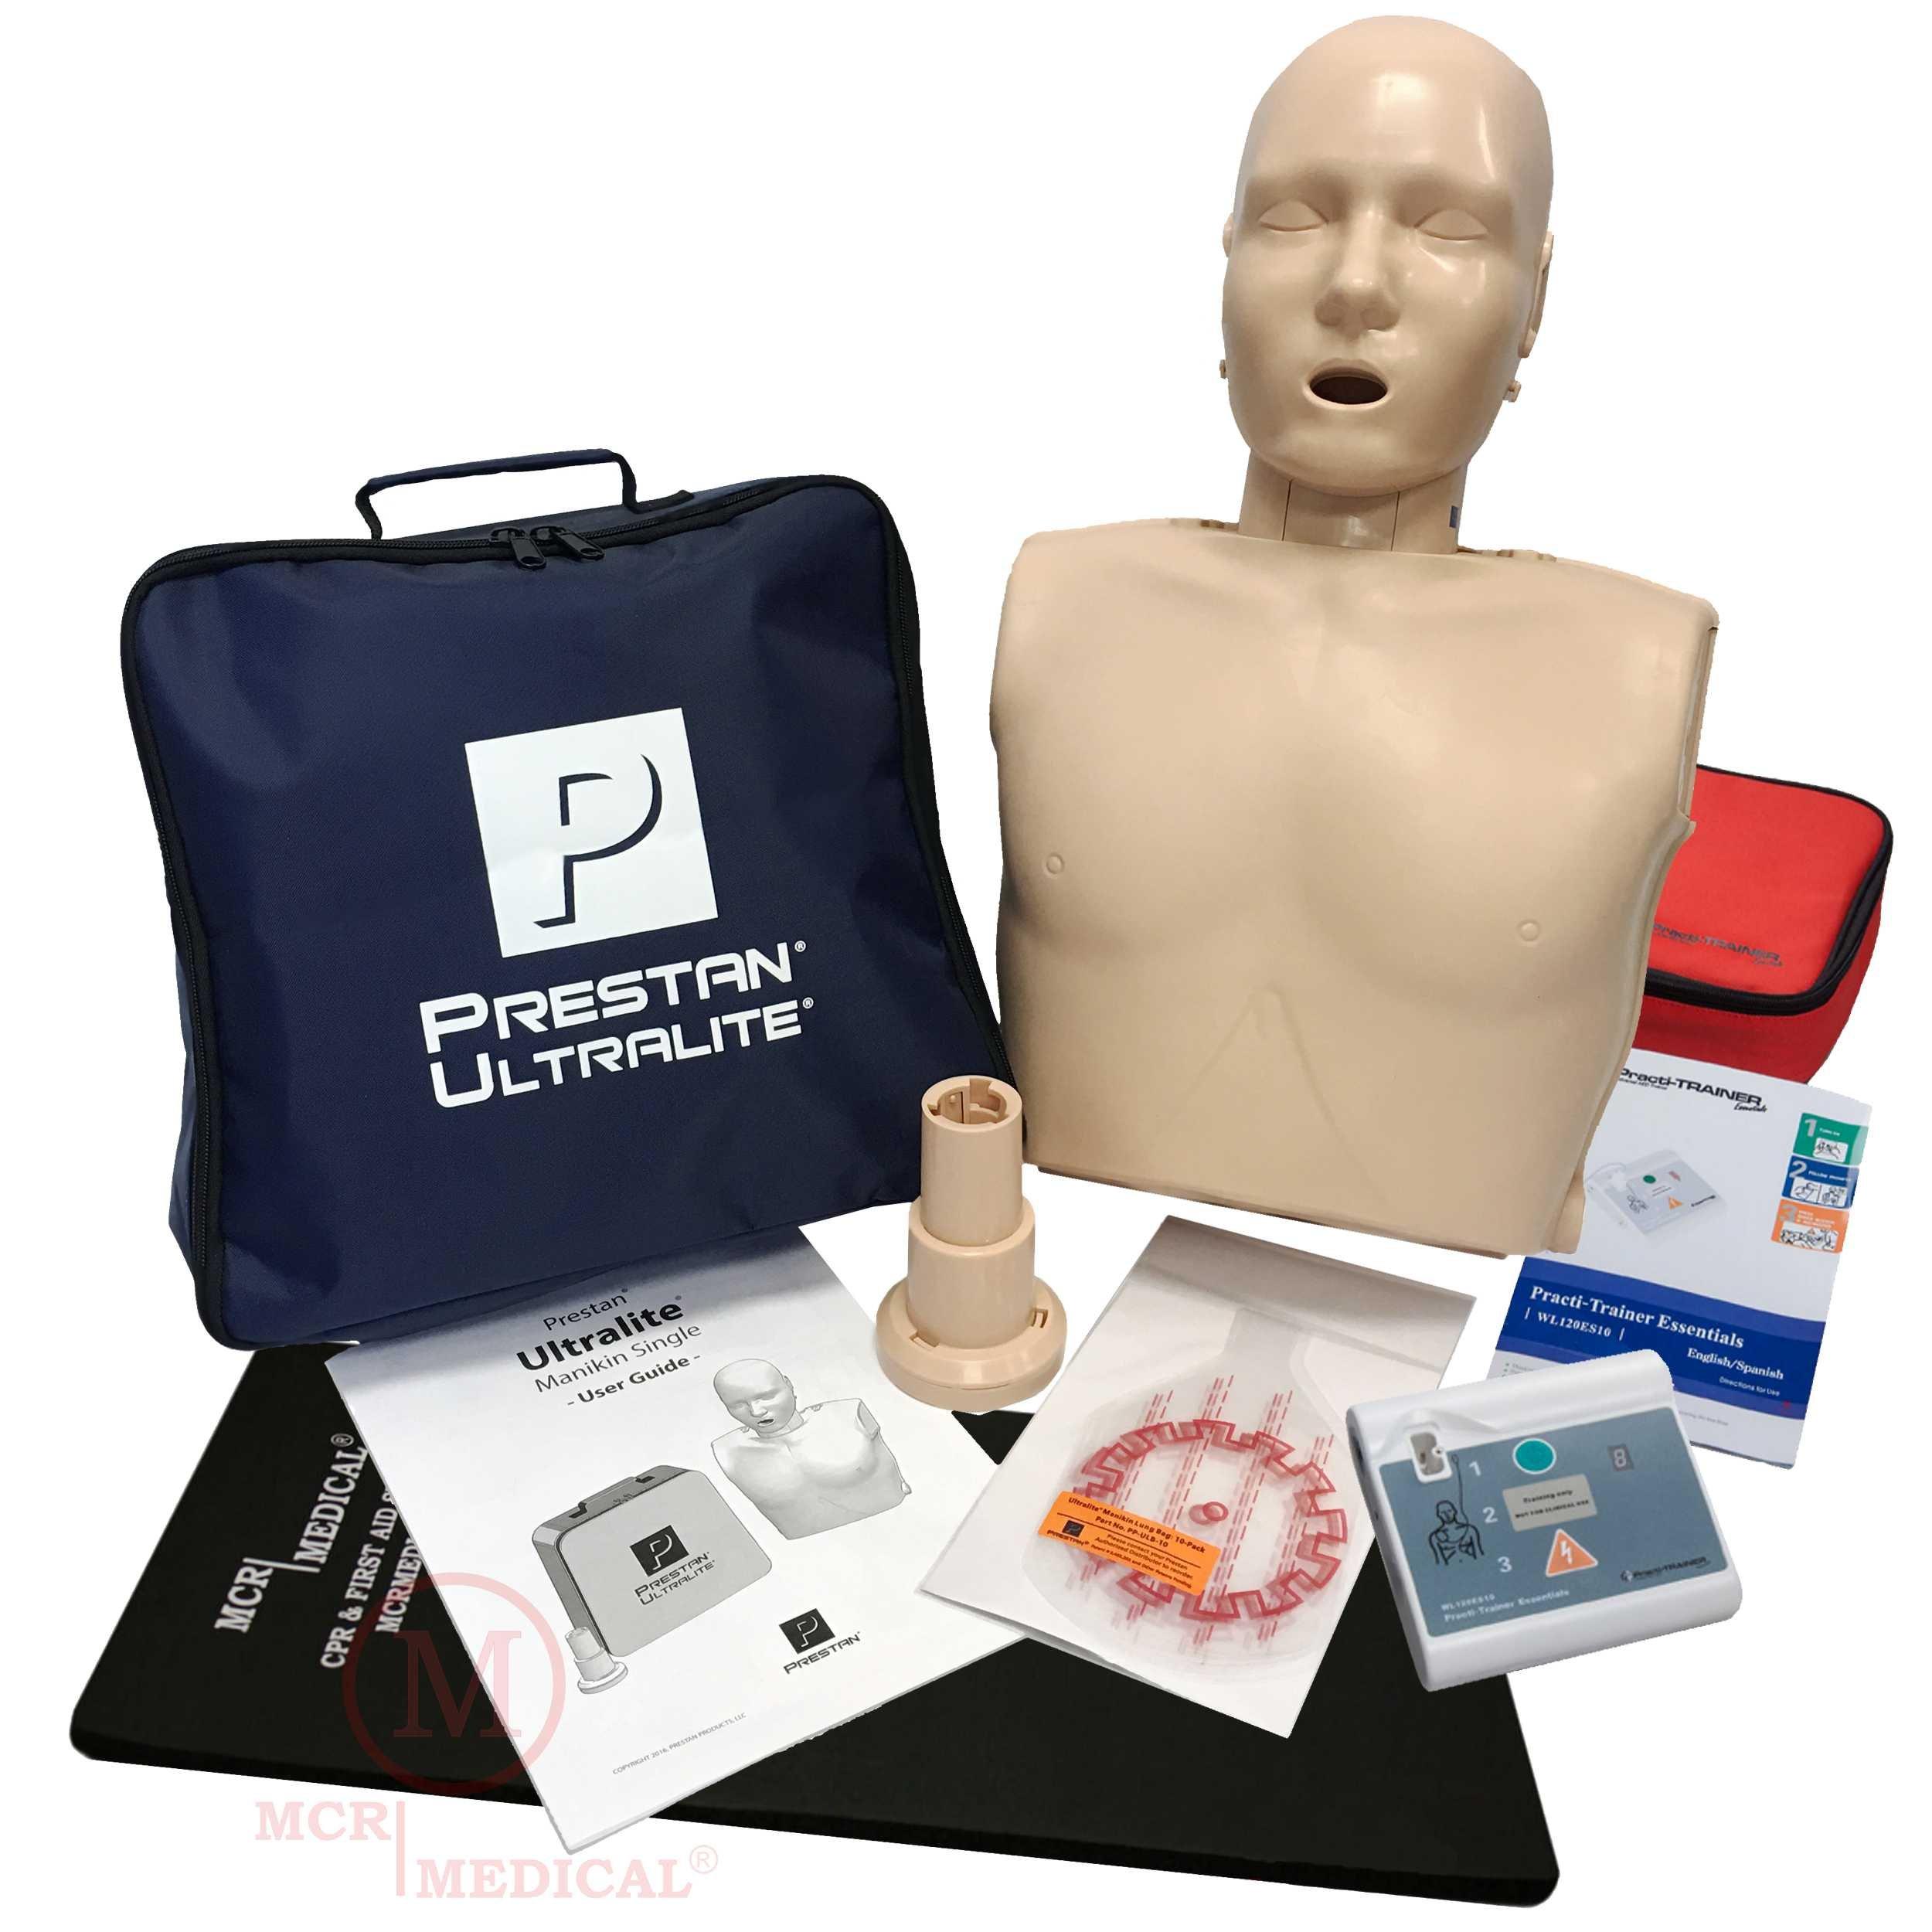 88c6100c17c Get Quotations · Basic CPR Training Kit w Prestan Ultralite CPR Manikin,  WNL Essentials AED Trainer, MCR